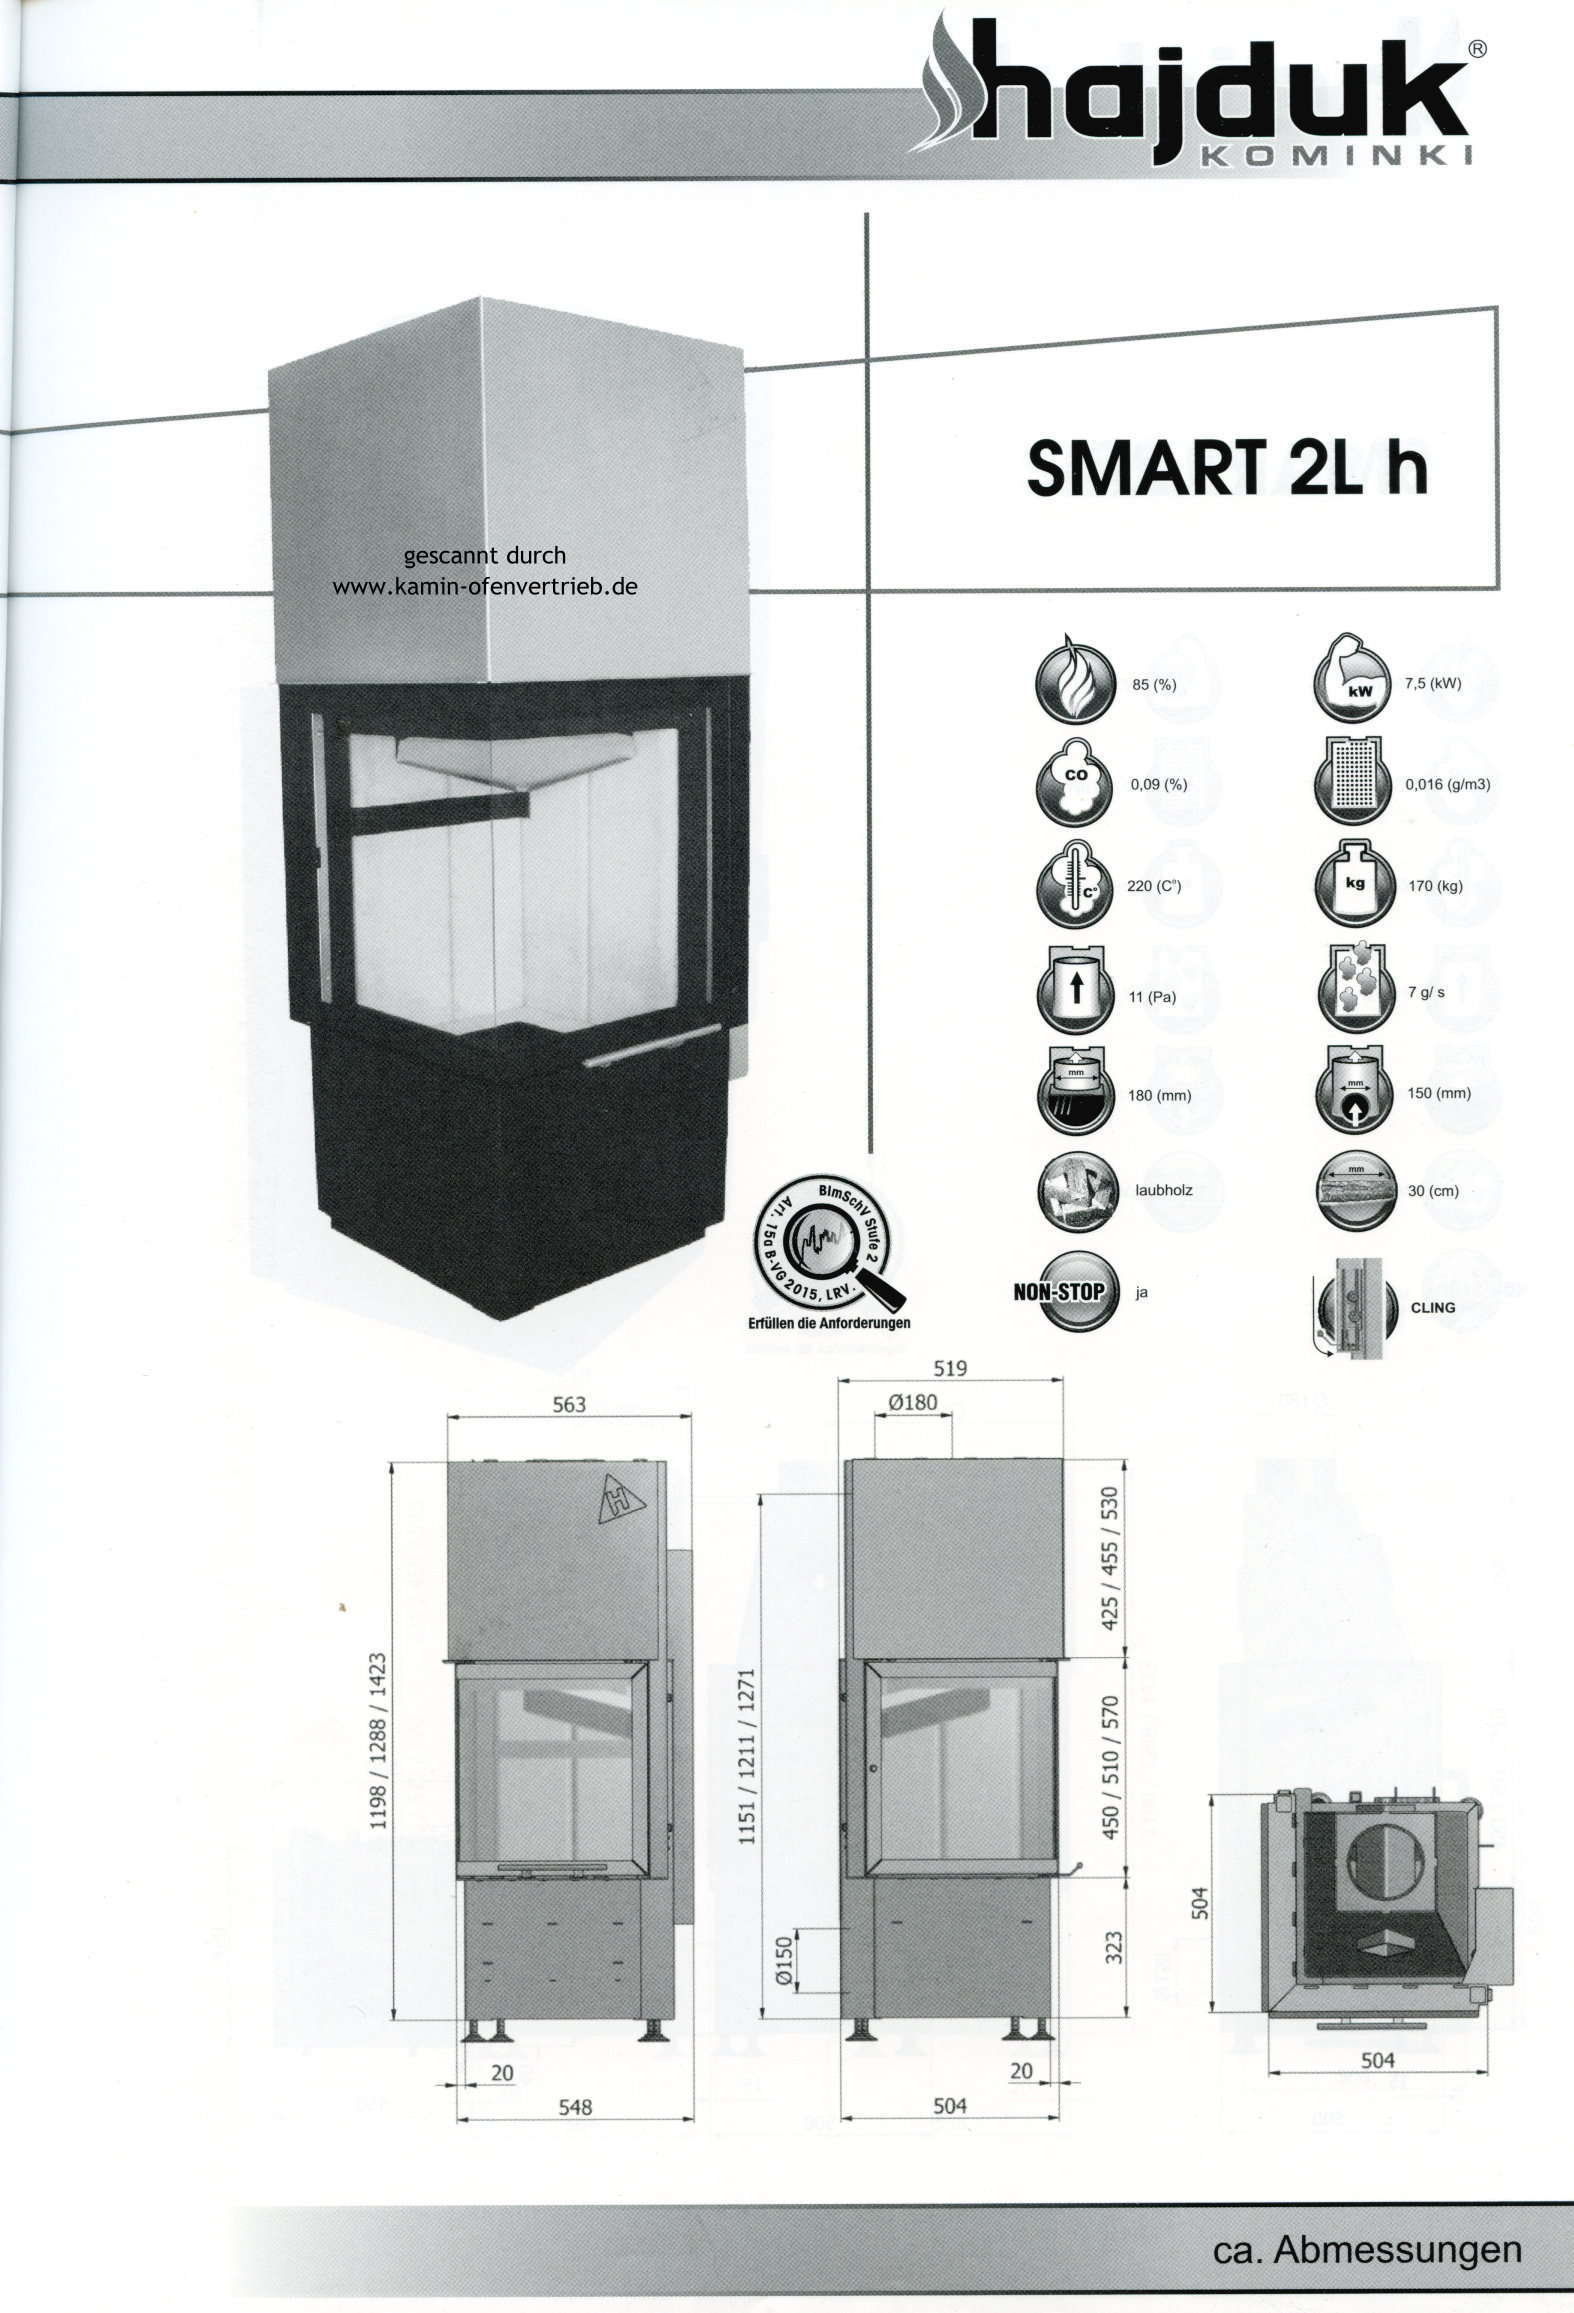 hajduk kamineinsatz smart 1vh1vht 2lh 2lp t qualit t aus polen. Black Bedroom Furniture Sets. Home Design Ideas